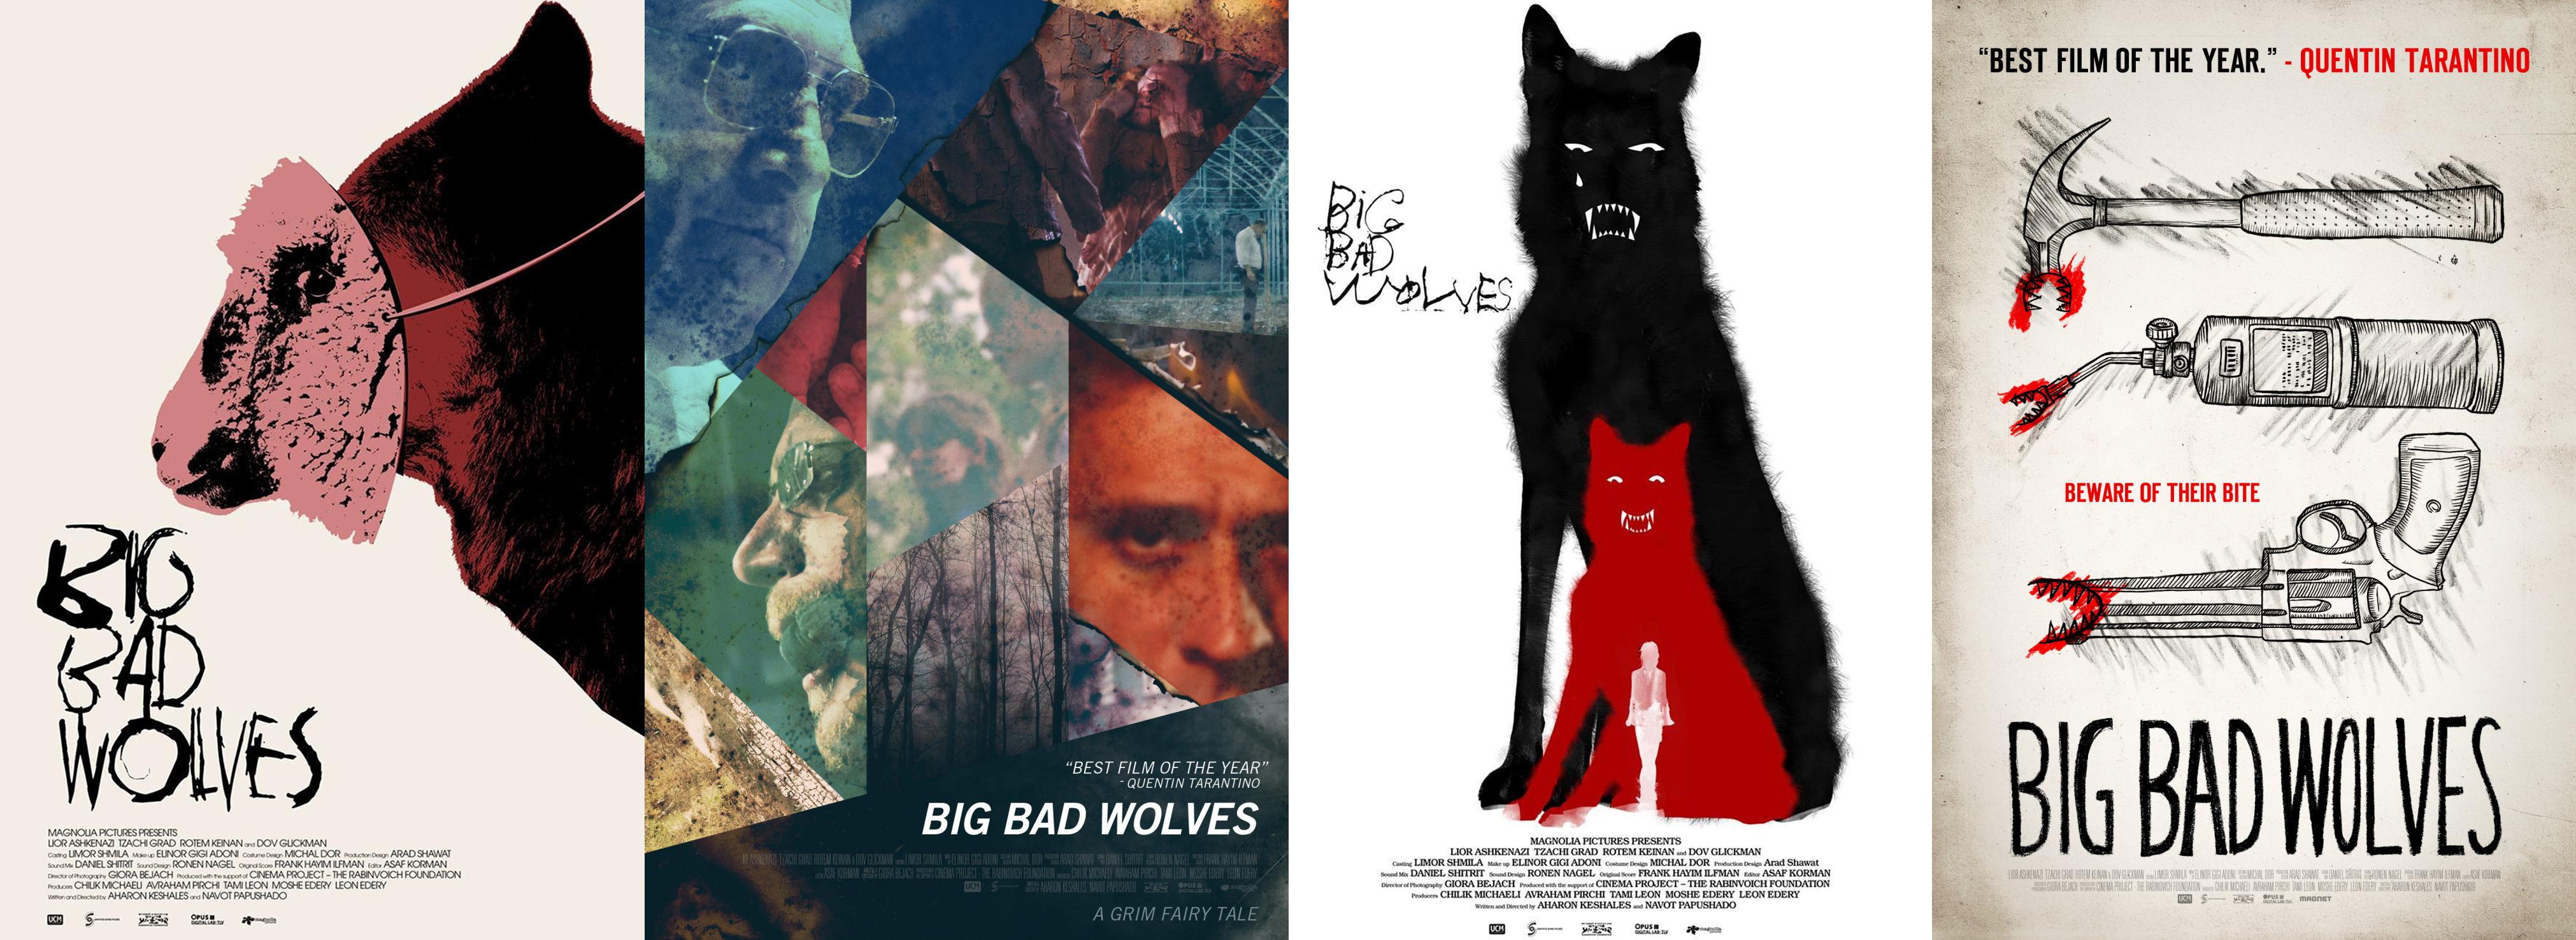 big bad wolf movie poster - photo #12